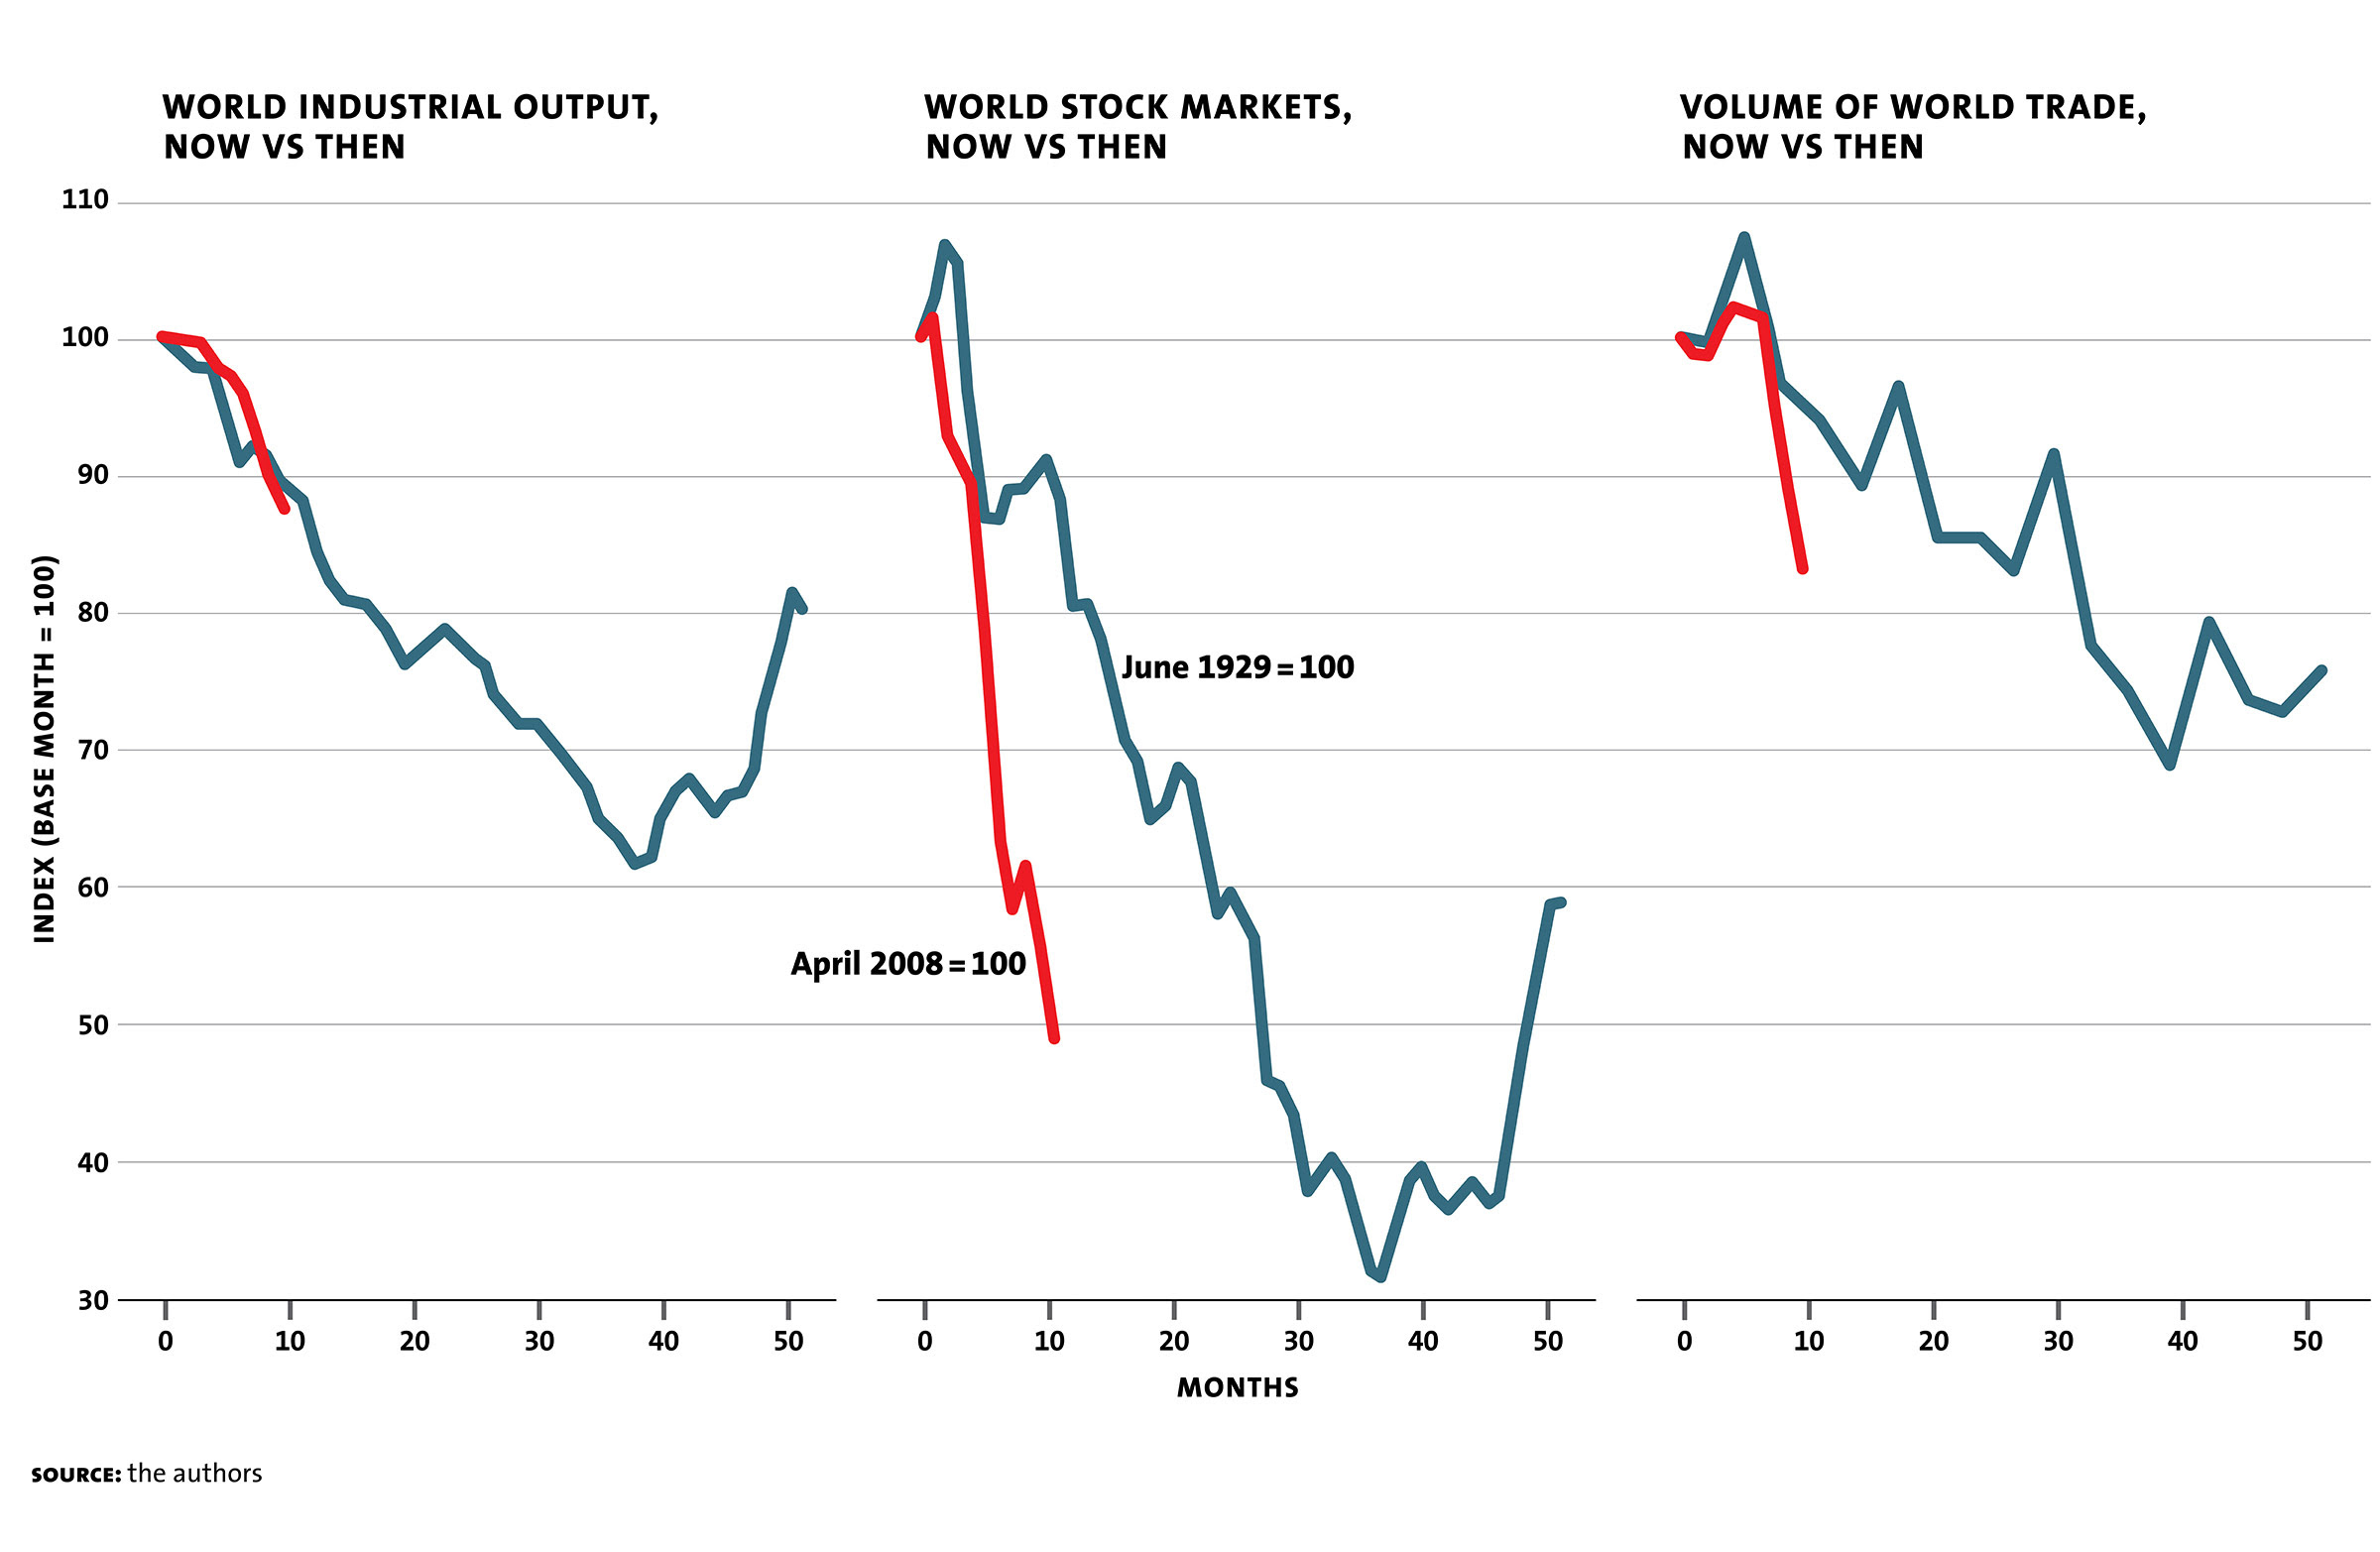 http://www.milkenreview.org/assets/Delong-J-Bradford-Depression-Recession-Chart4.jpg